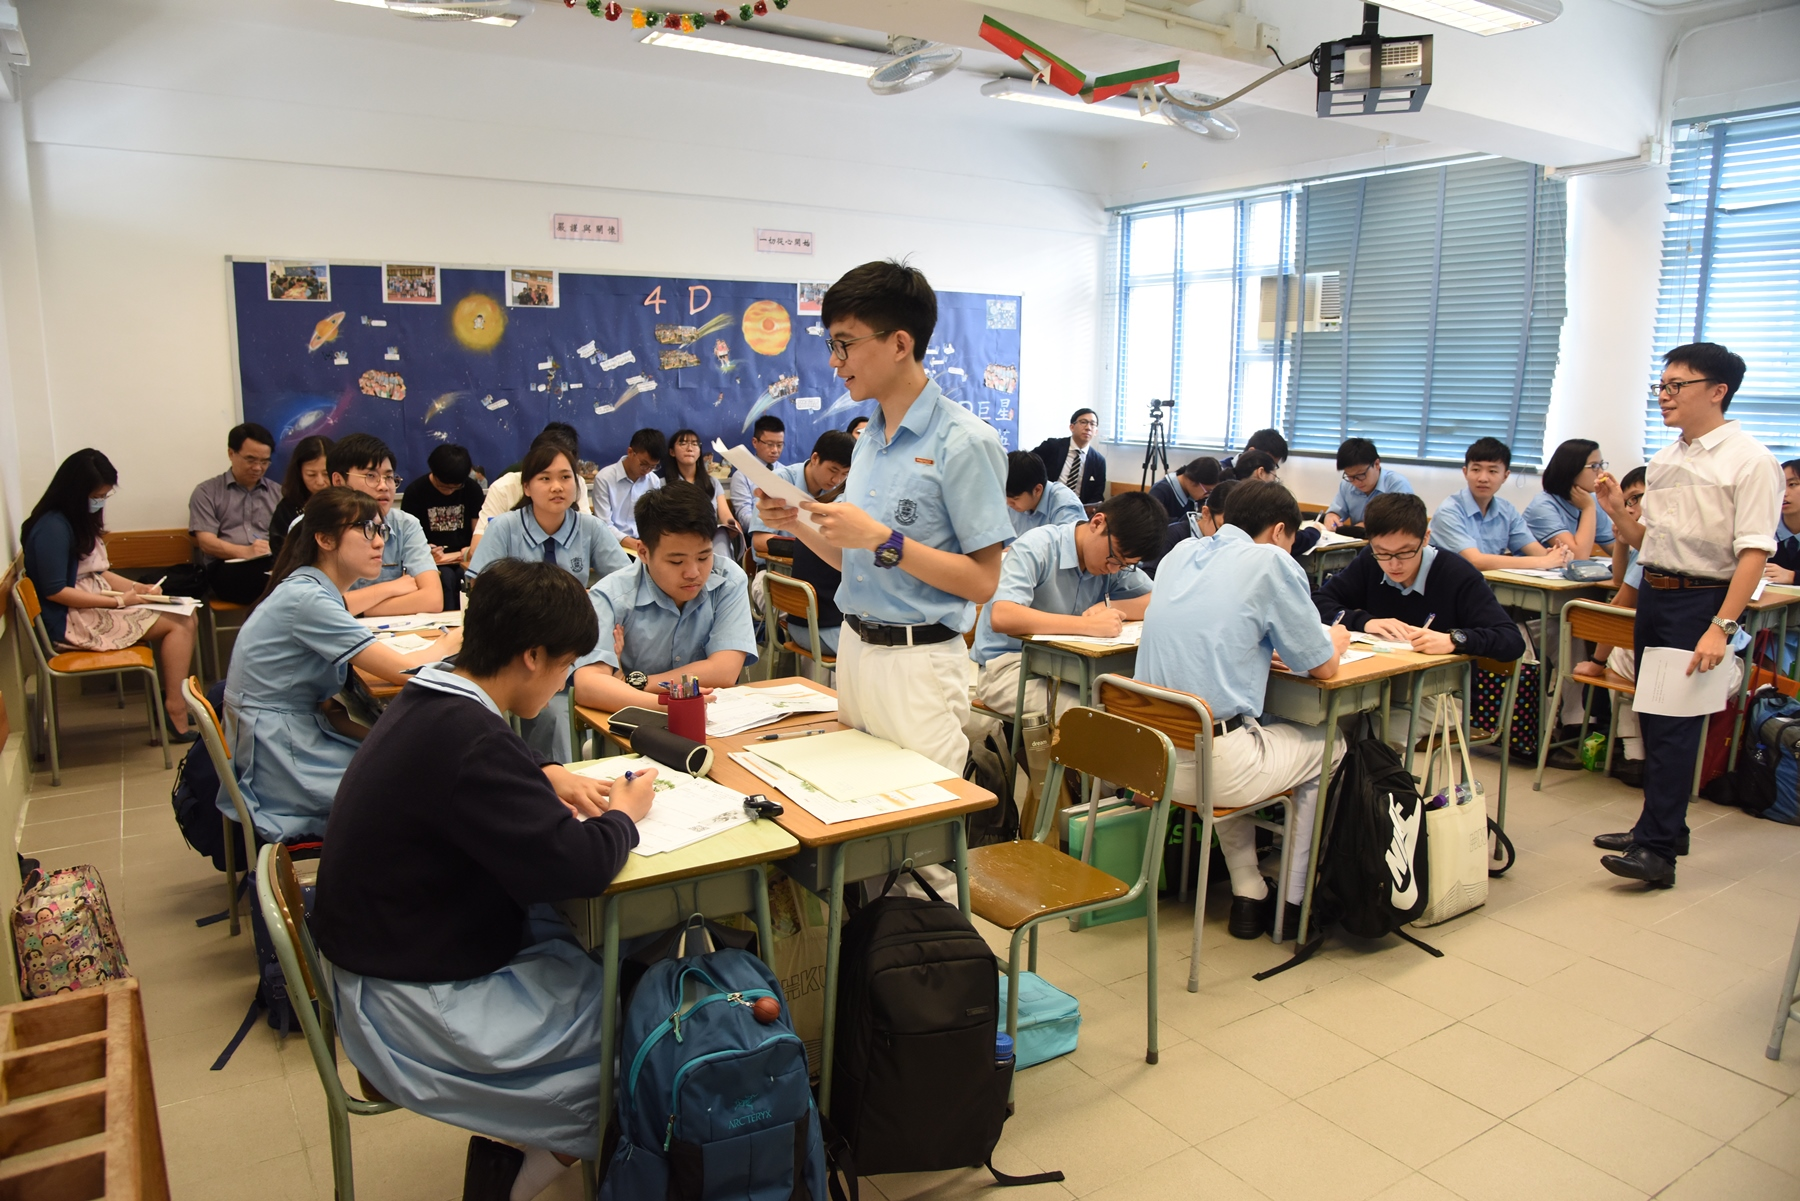 http://npc.edu.hk/sites/default/files/dsc_0642.jpg